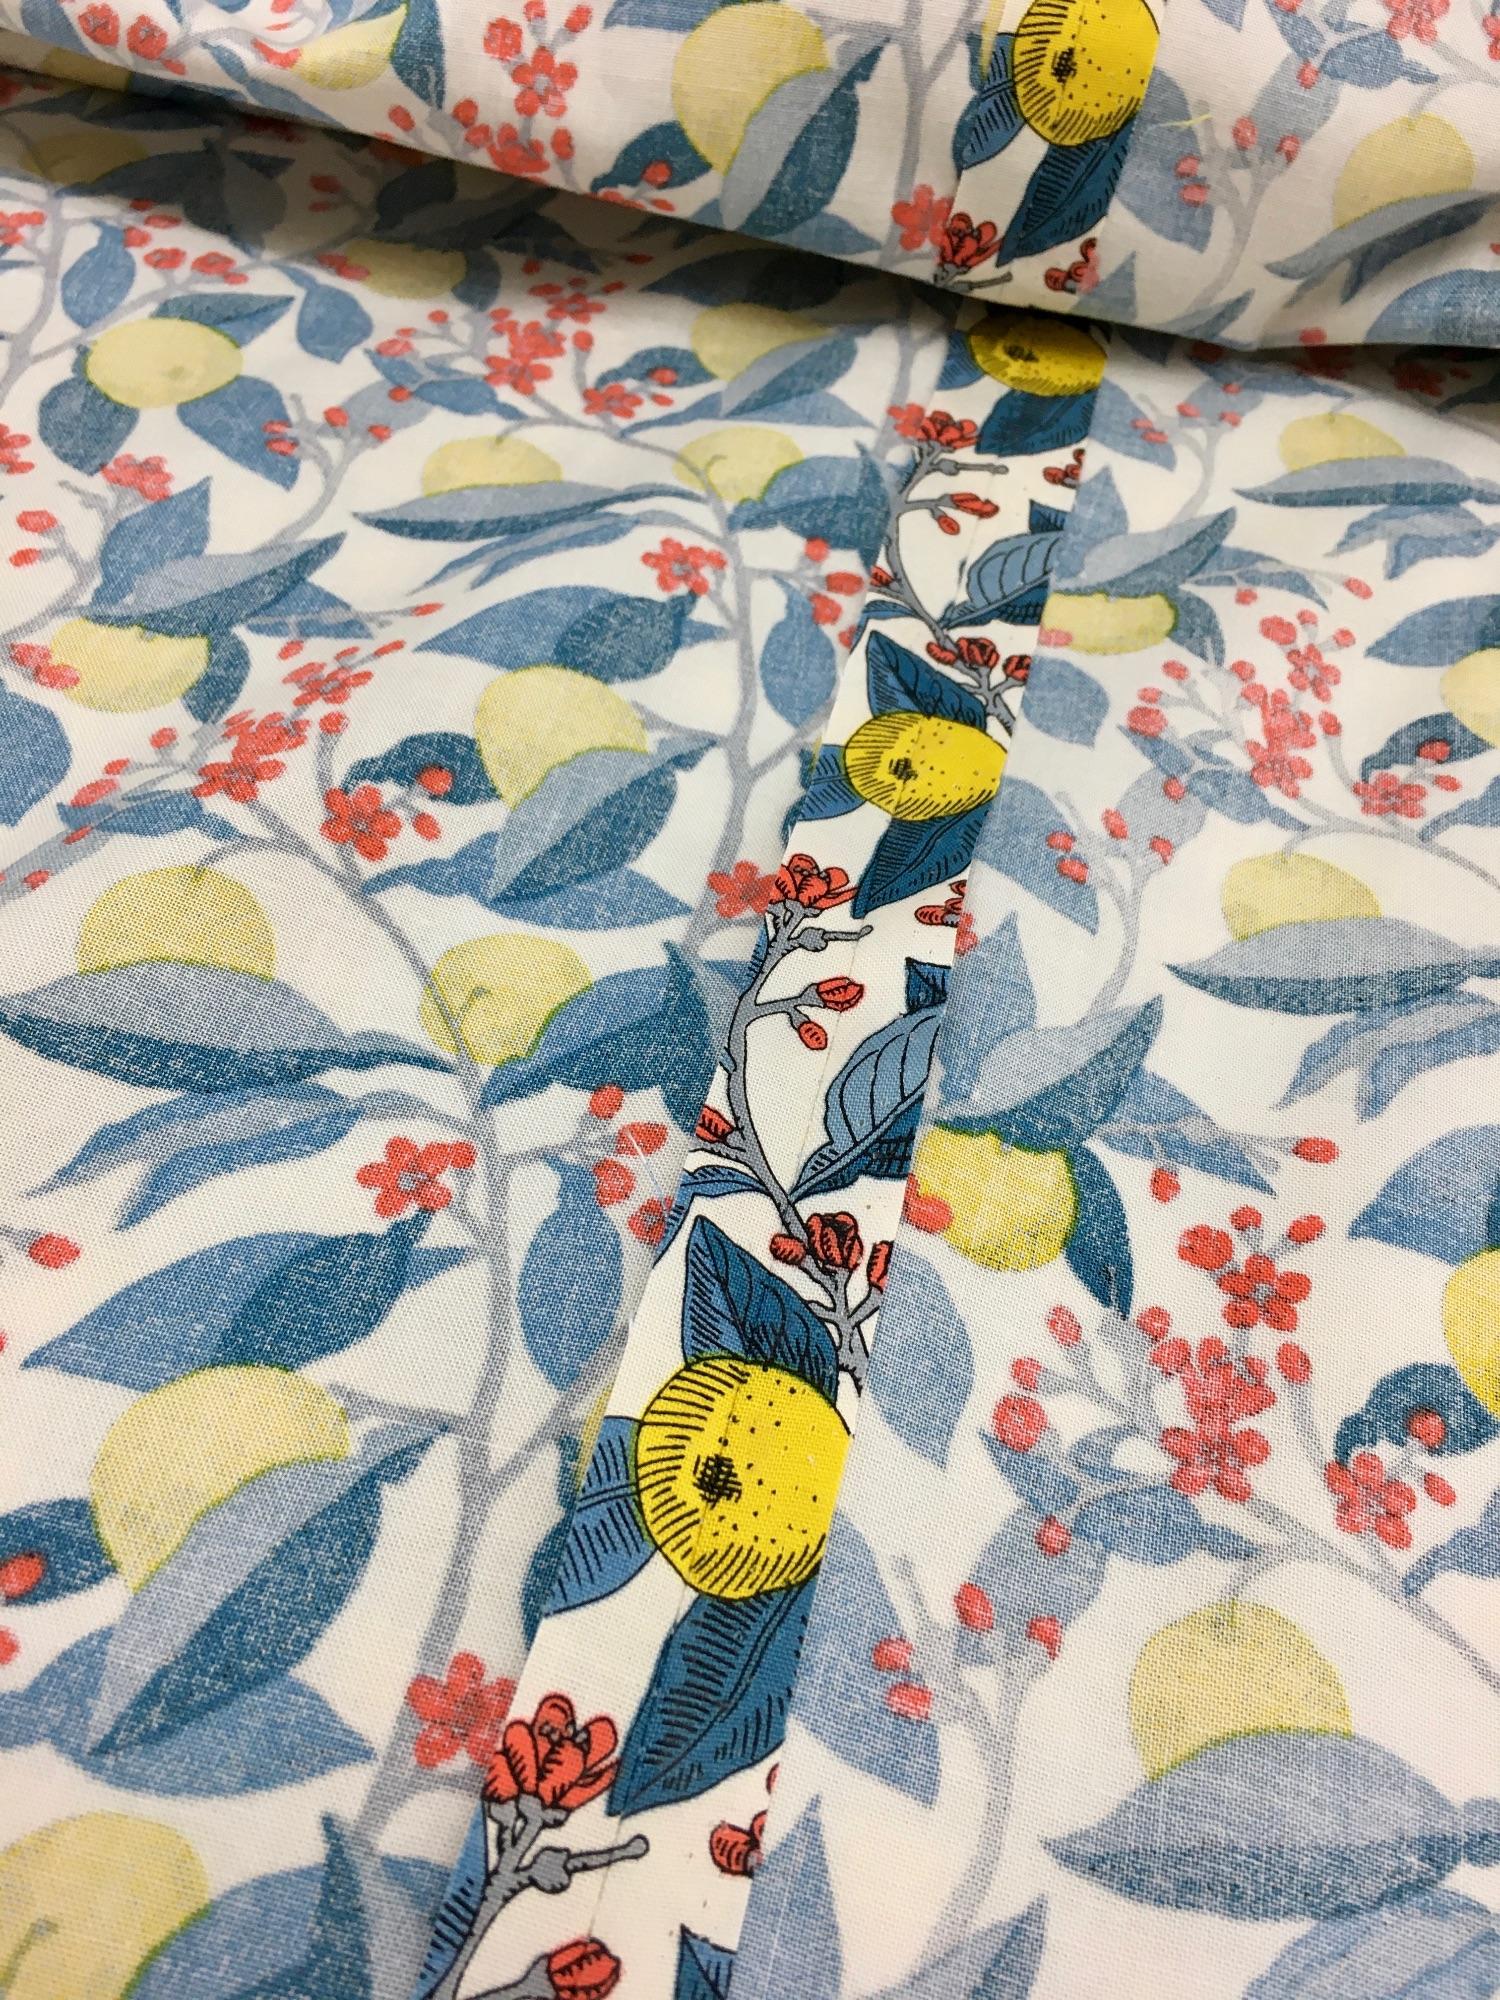 Matched backing fabric seam